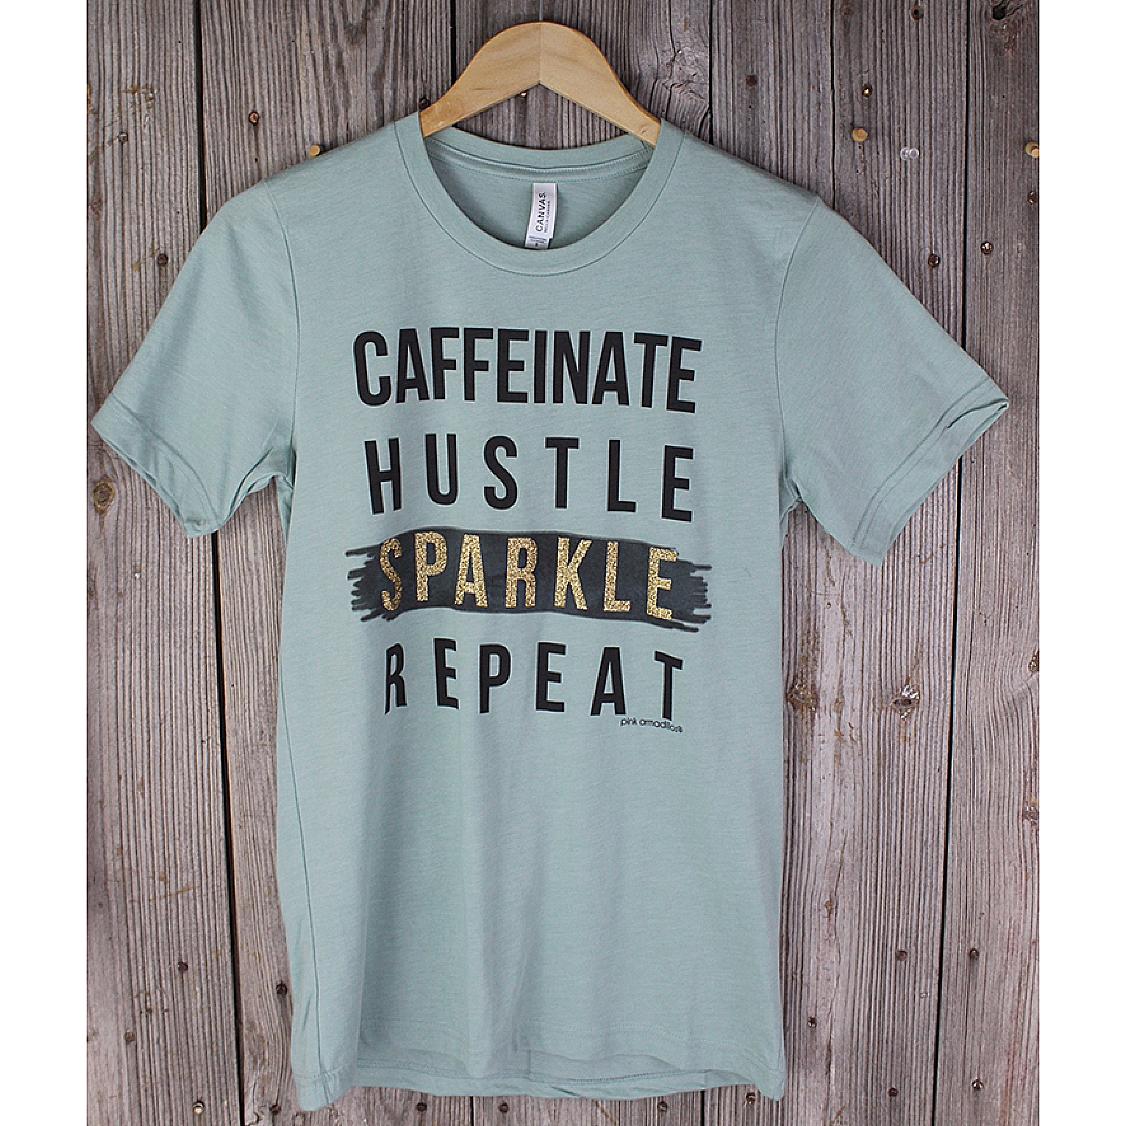 Caffeinate Hustle Sparkle Tee Shirt